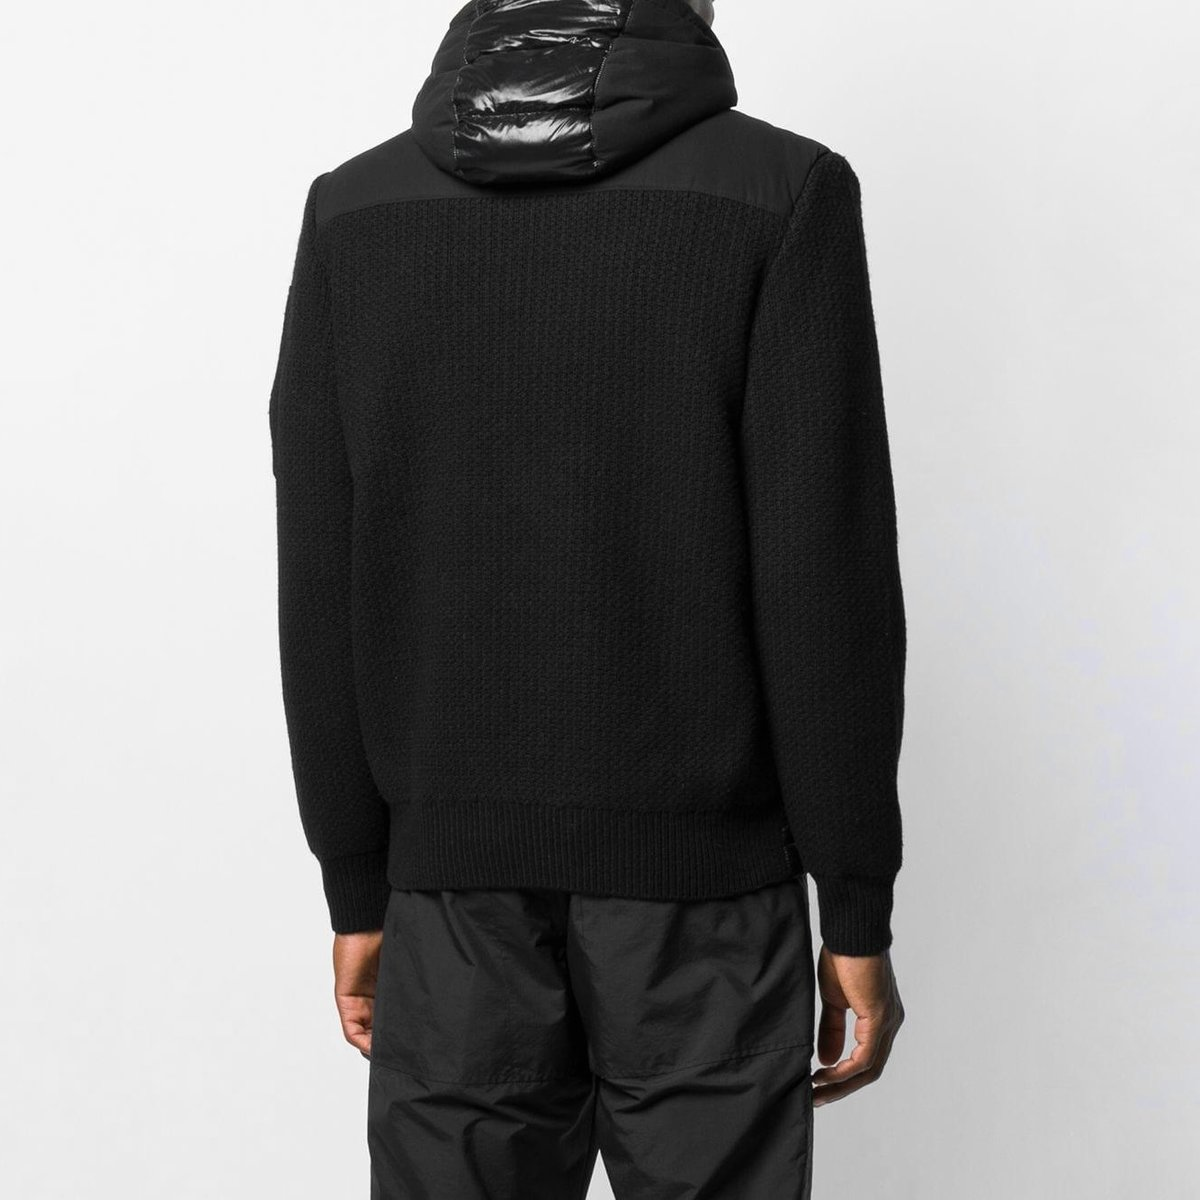 c-p-company-Black-Zipped-Padded-Jacket (1).jpg